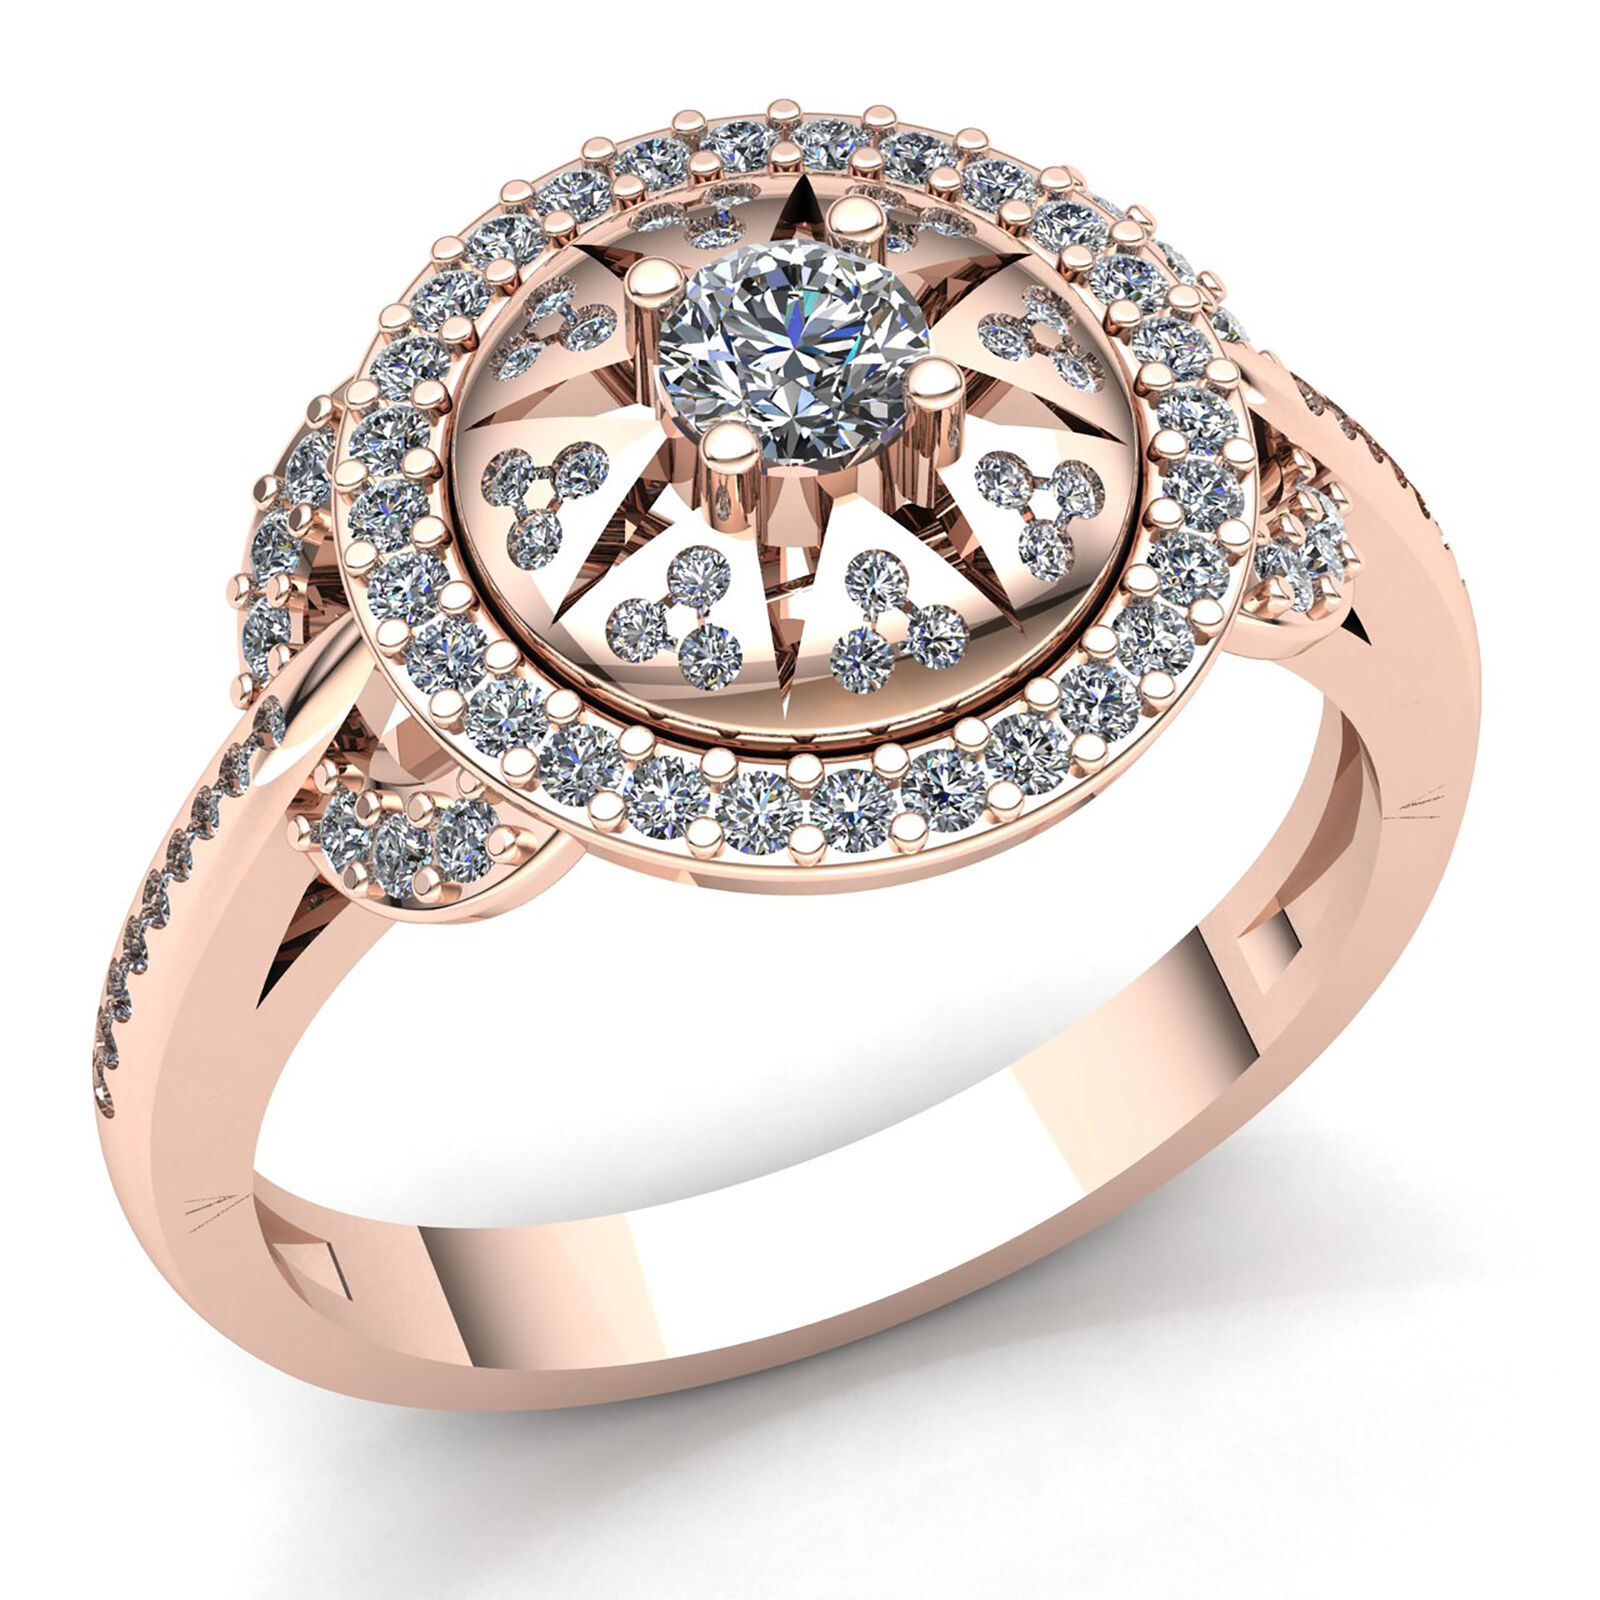 Natural 1ct Round Cut Diamond Ladies Bridal Pave Halo Engagement Ring 10K gold